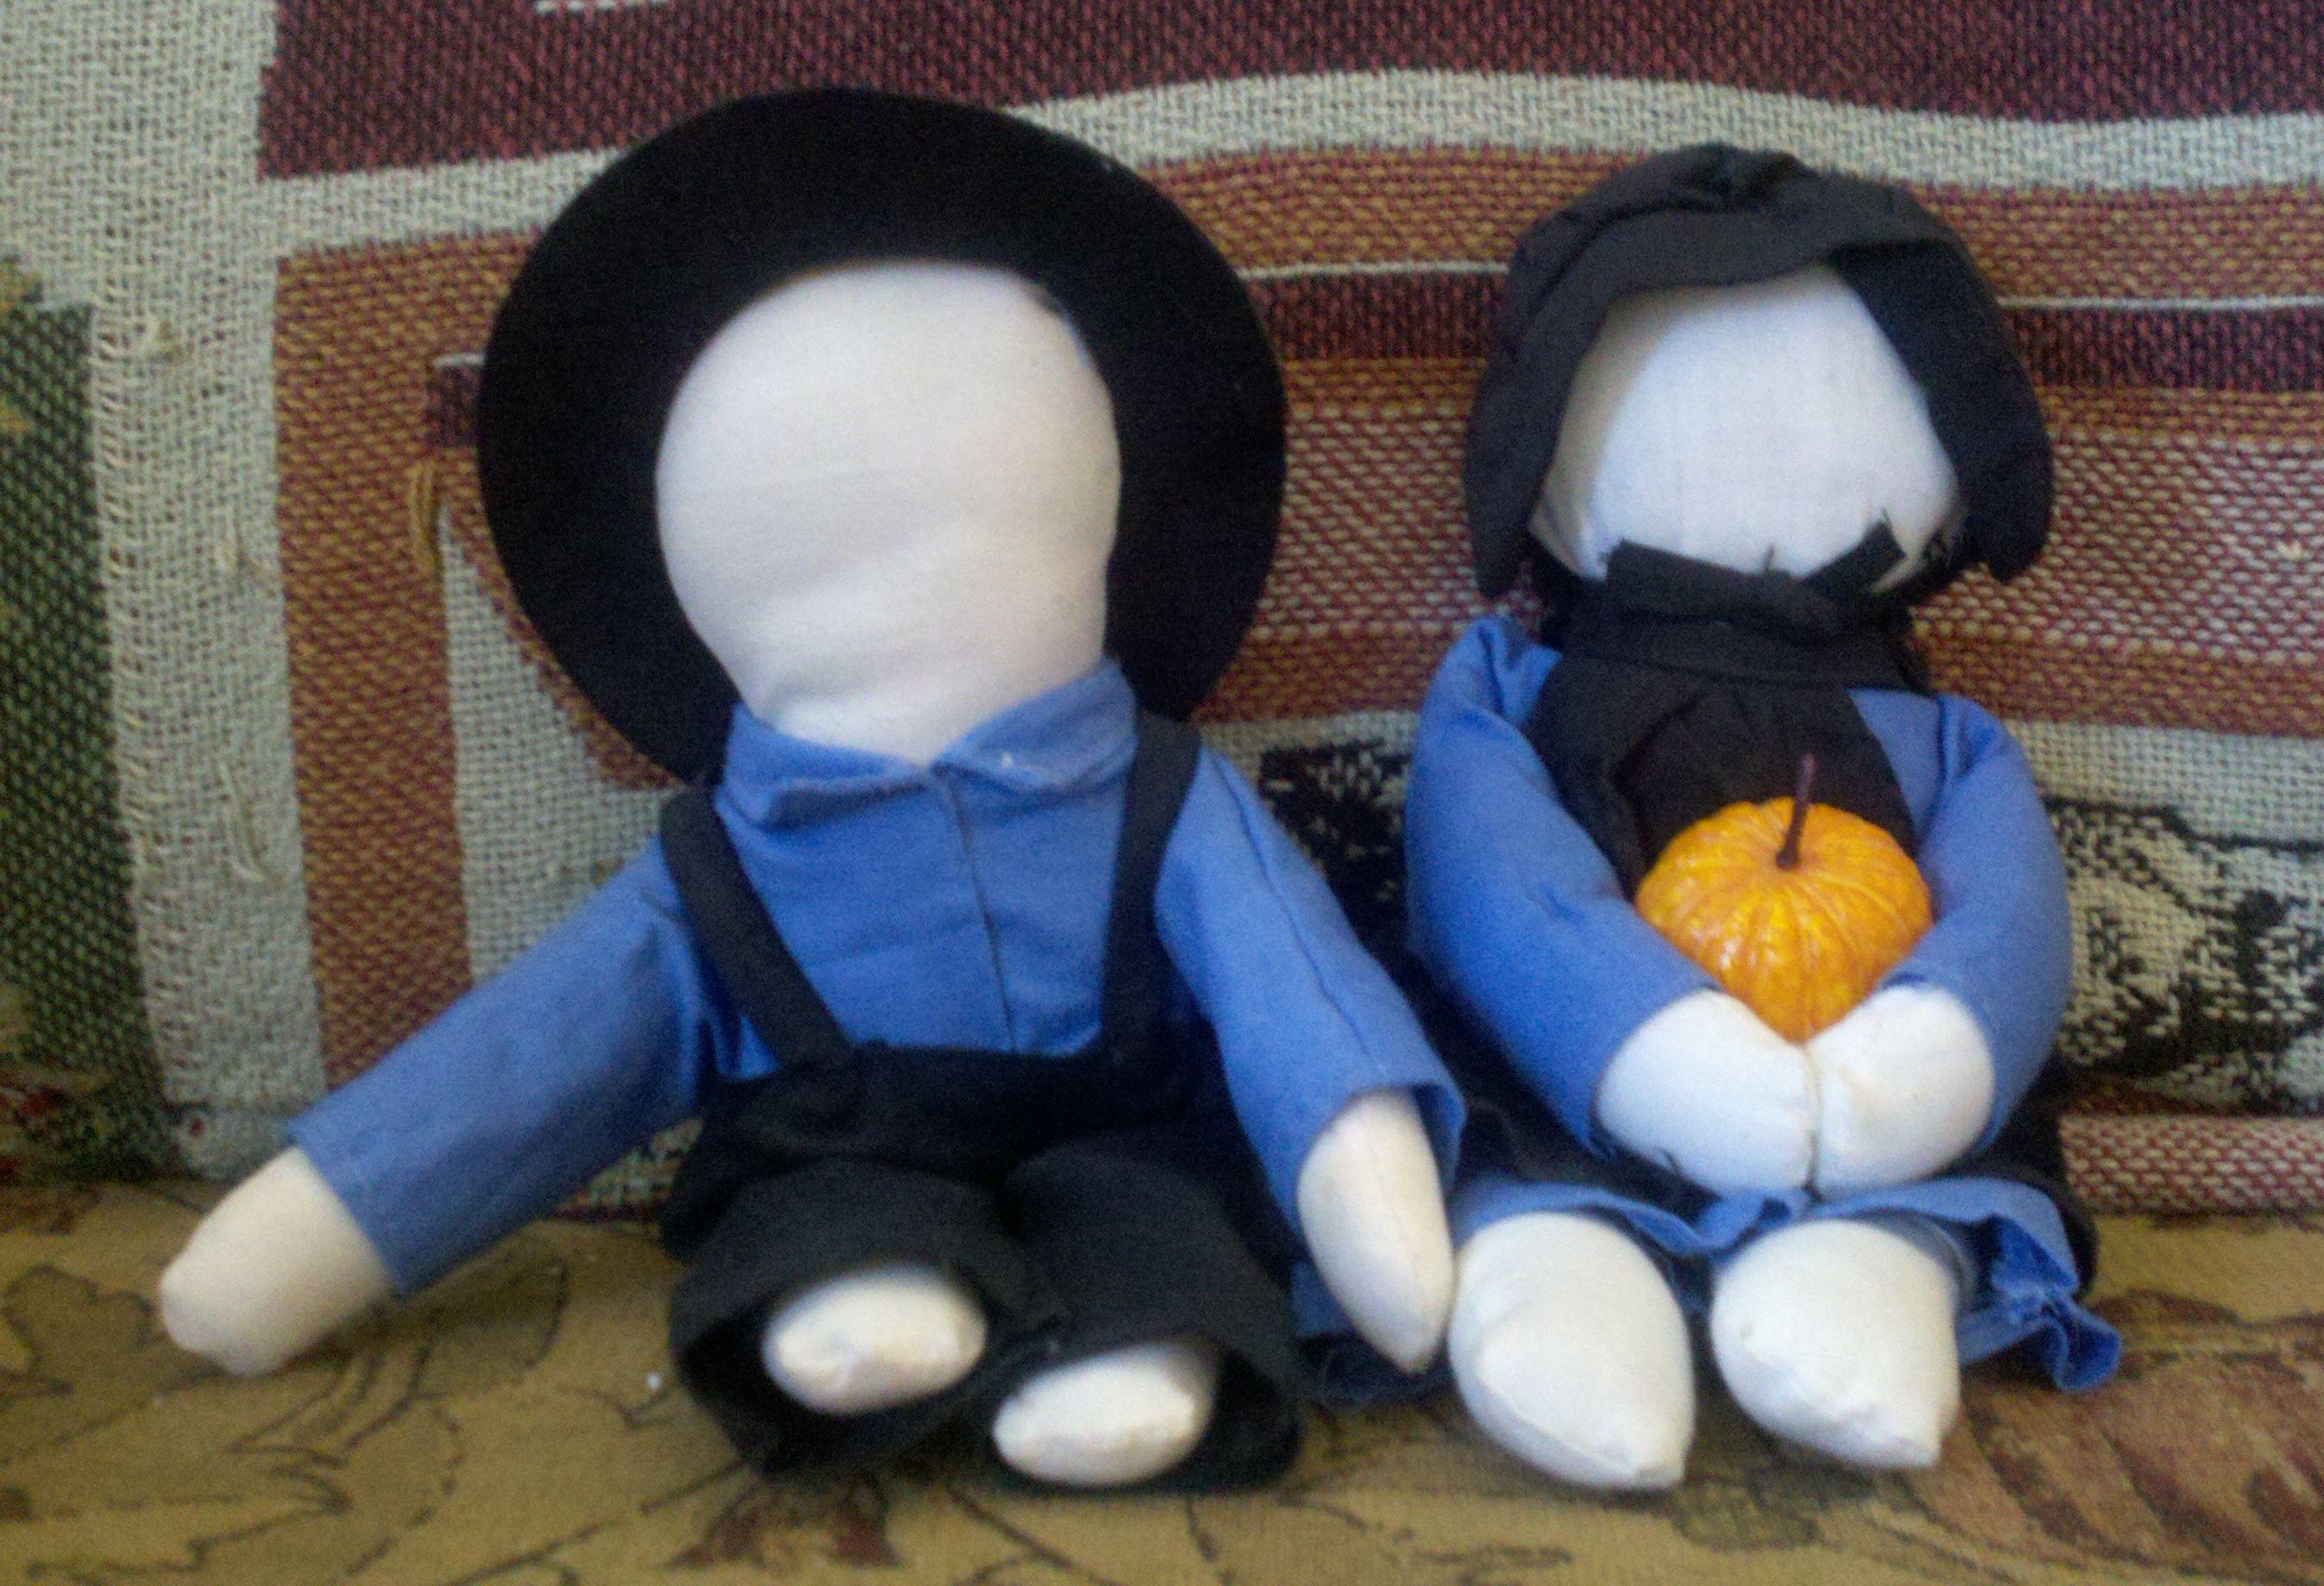 Amish doll - Wikipedia, the free encyclopedia   Amish ...